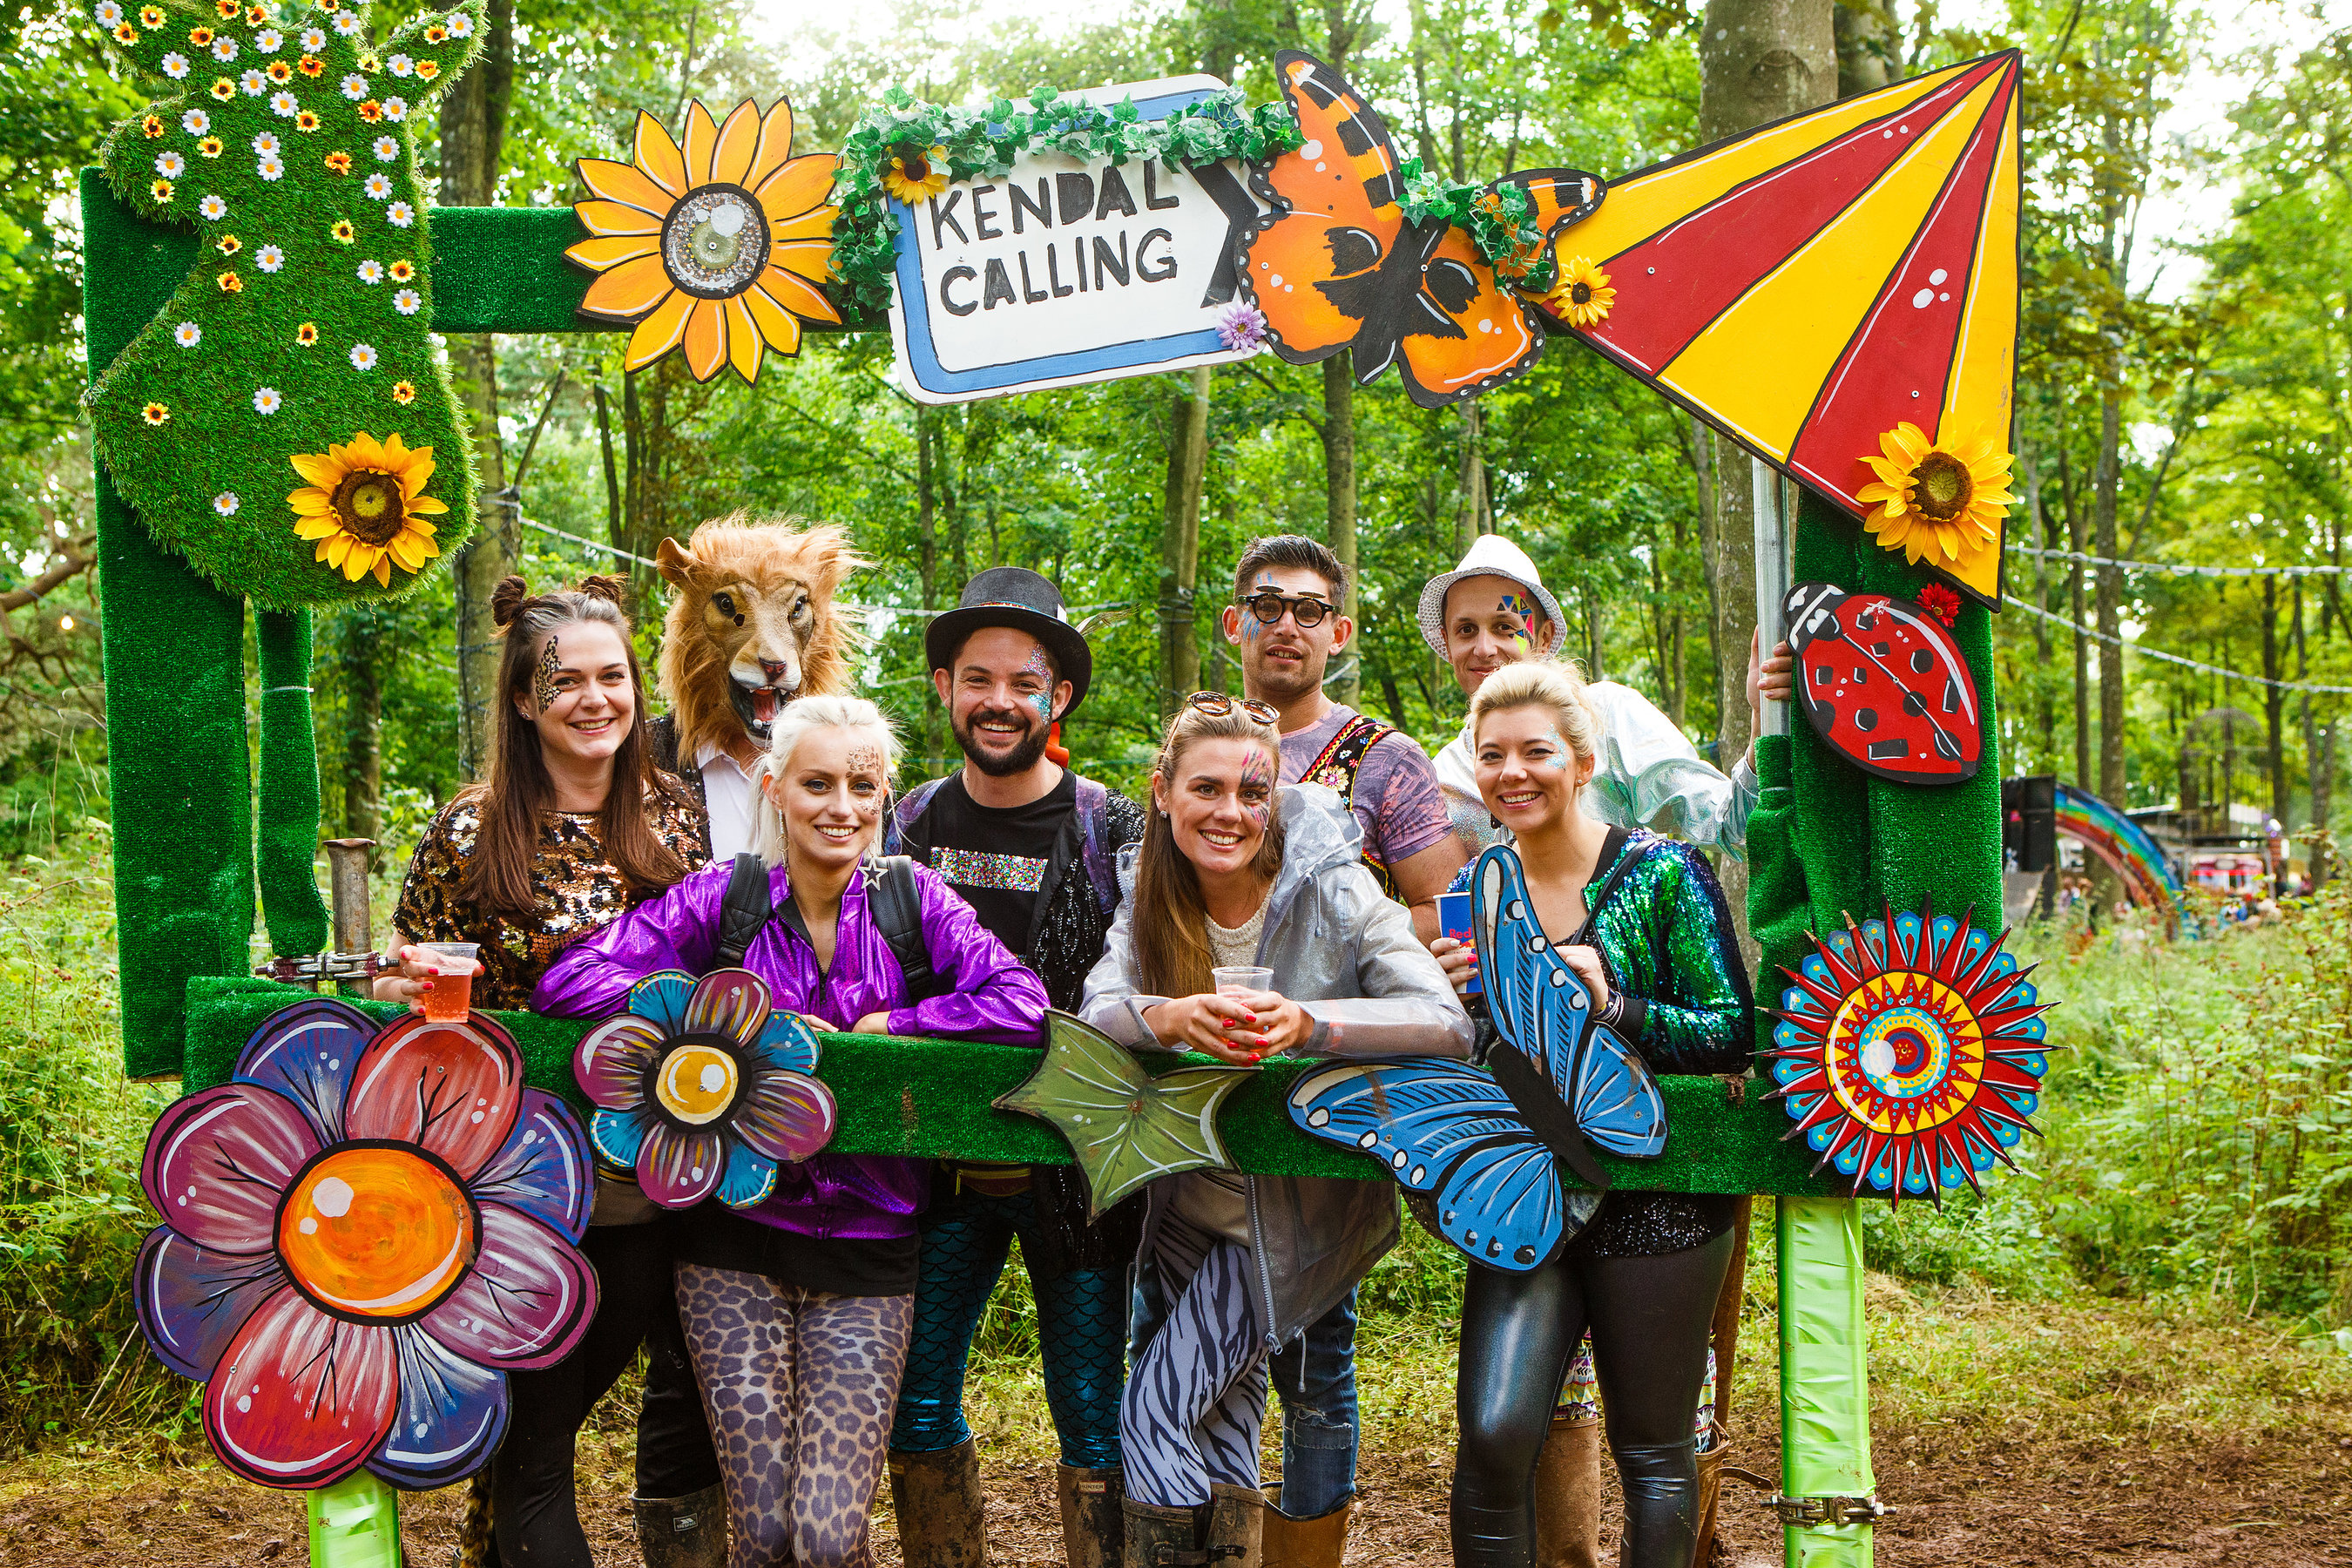 Kendal-Calling-festival-news-Calling-all-volunteers-Kendal-Calling